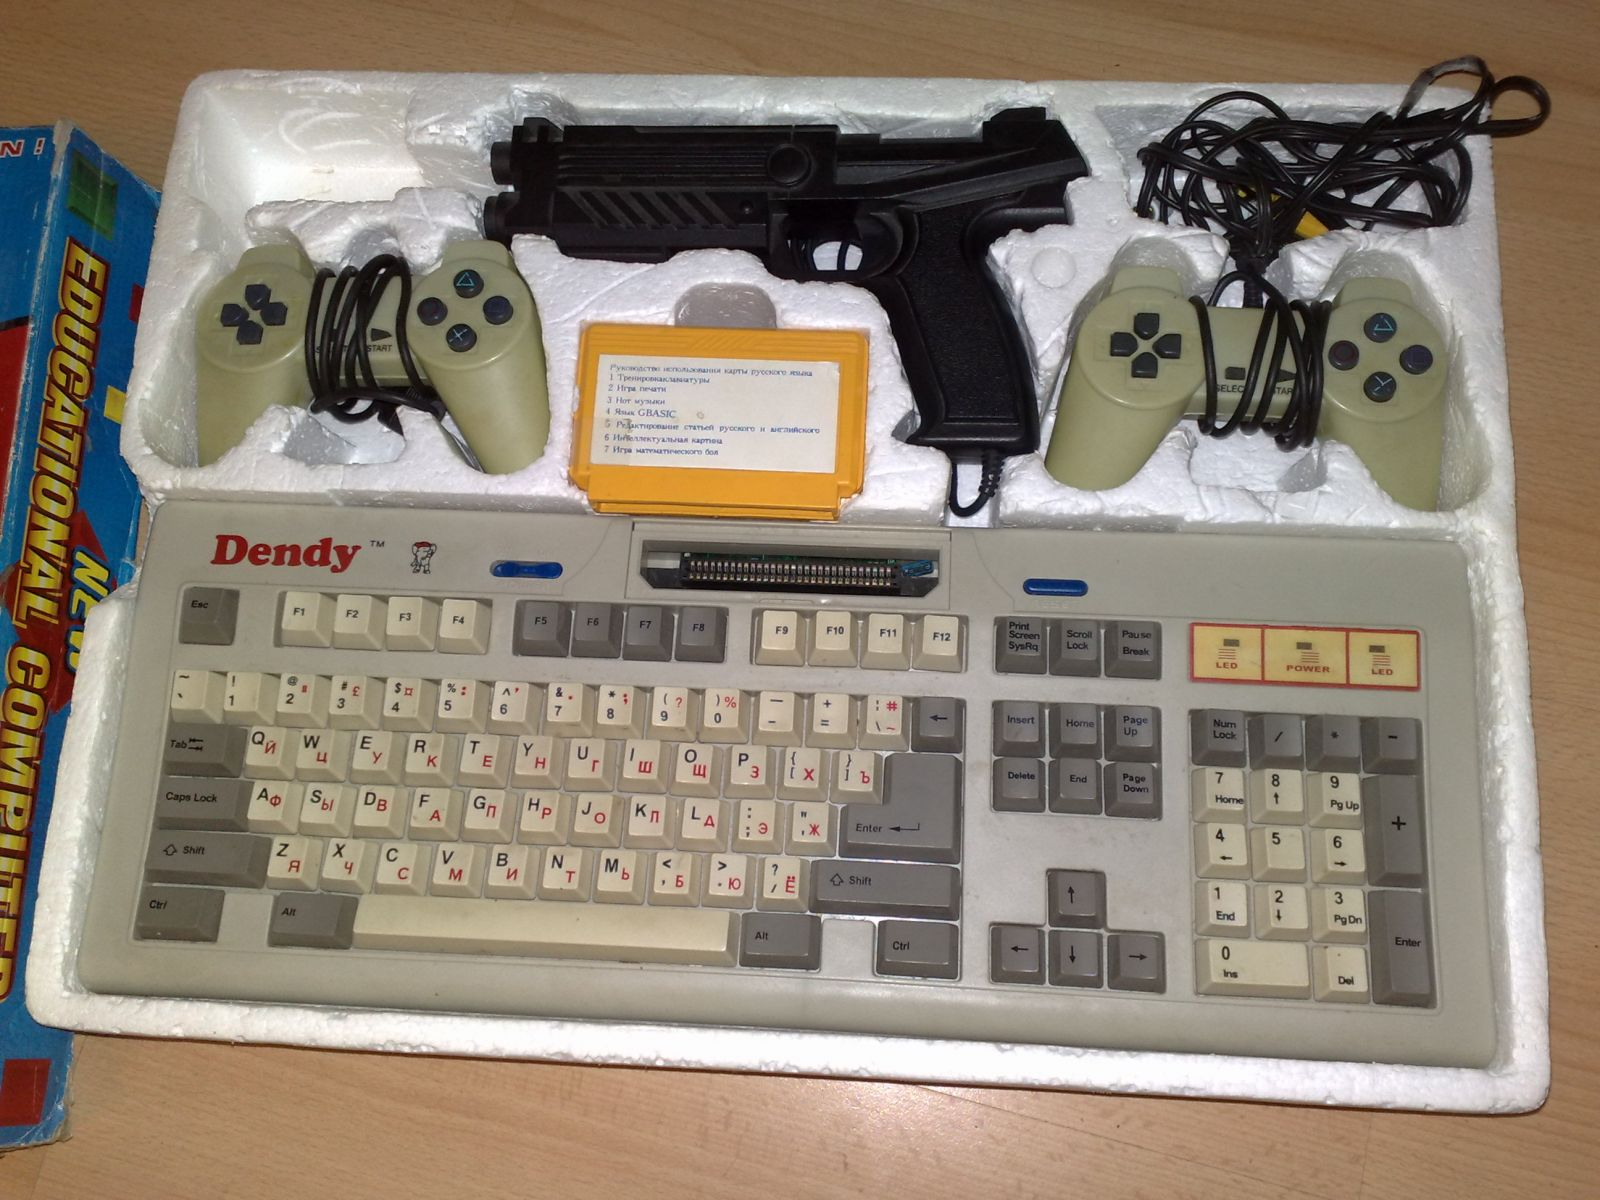 Dendy 8Bit Educational Computer